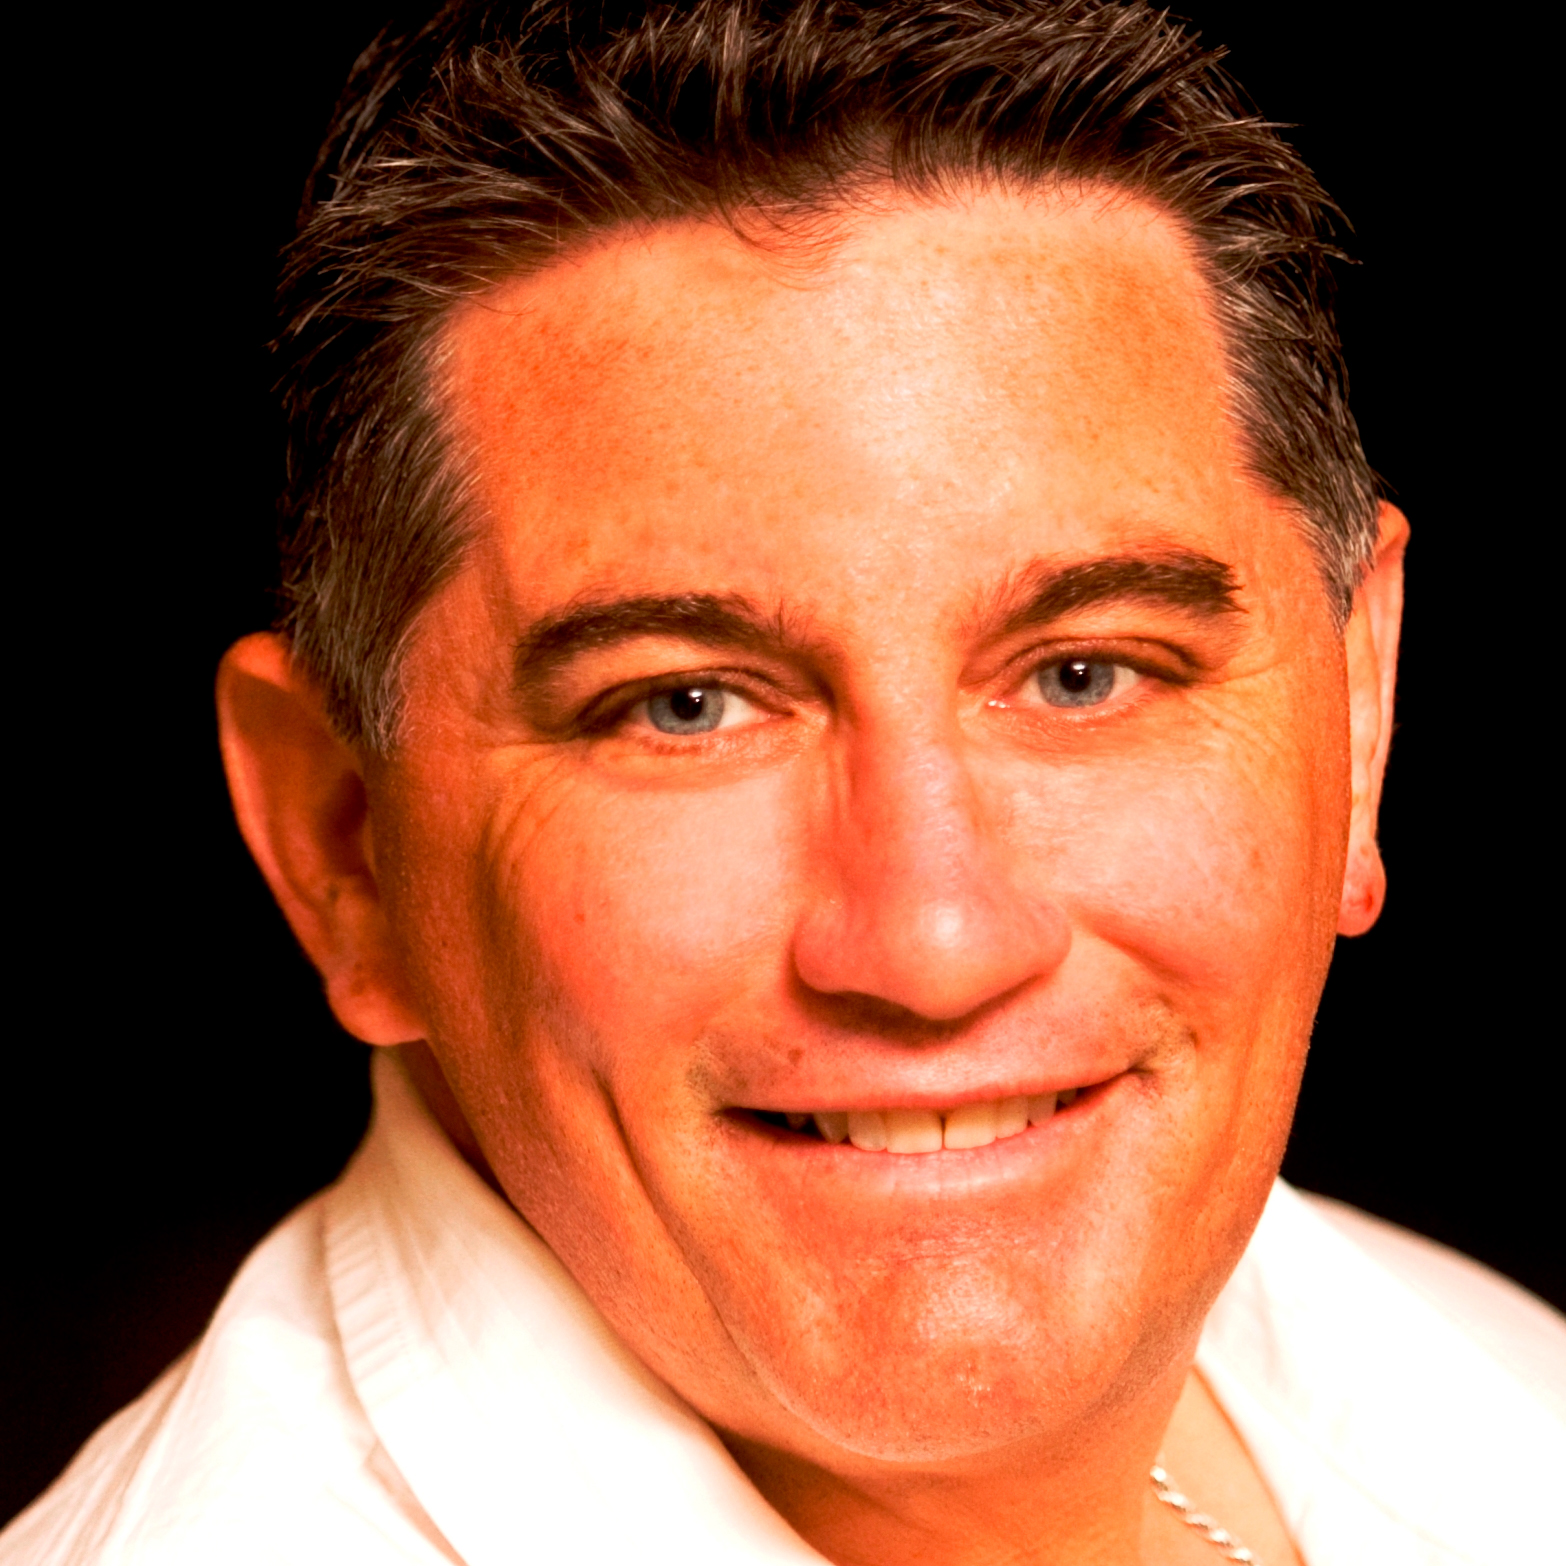 Michael Perreault